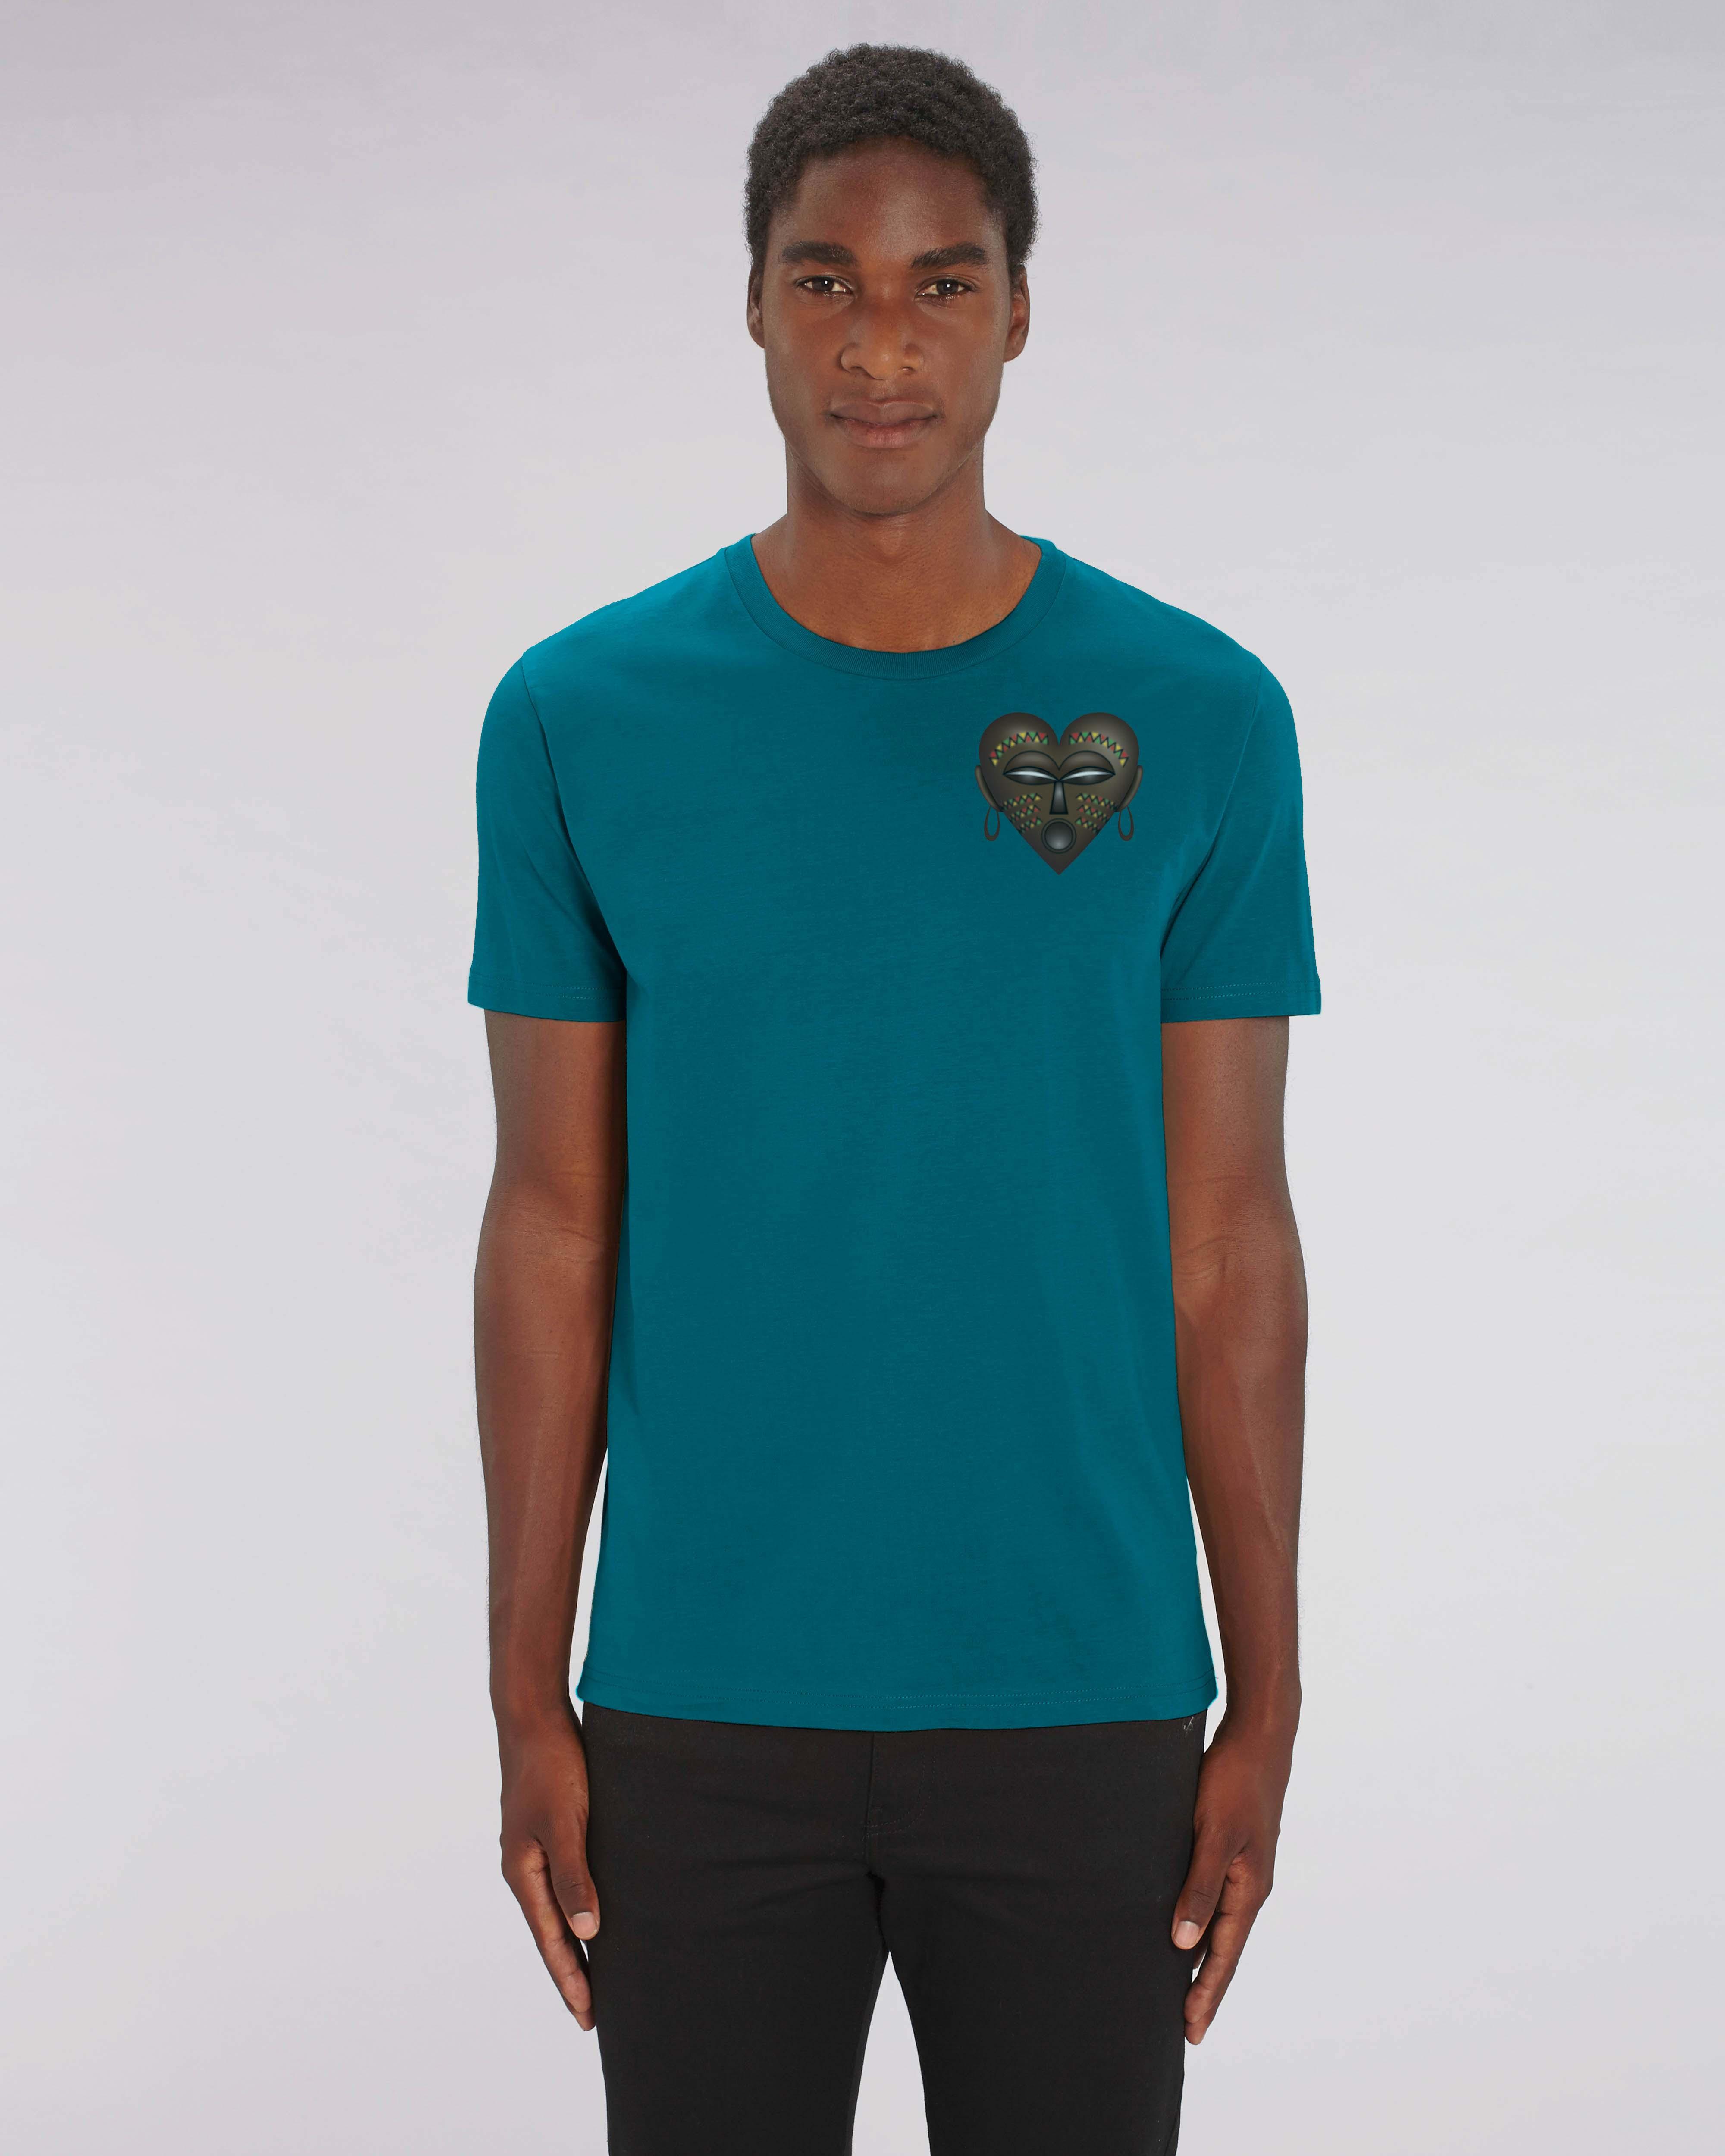 T-shirt Vert Bio Homme - African Tee